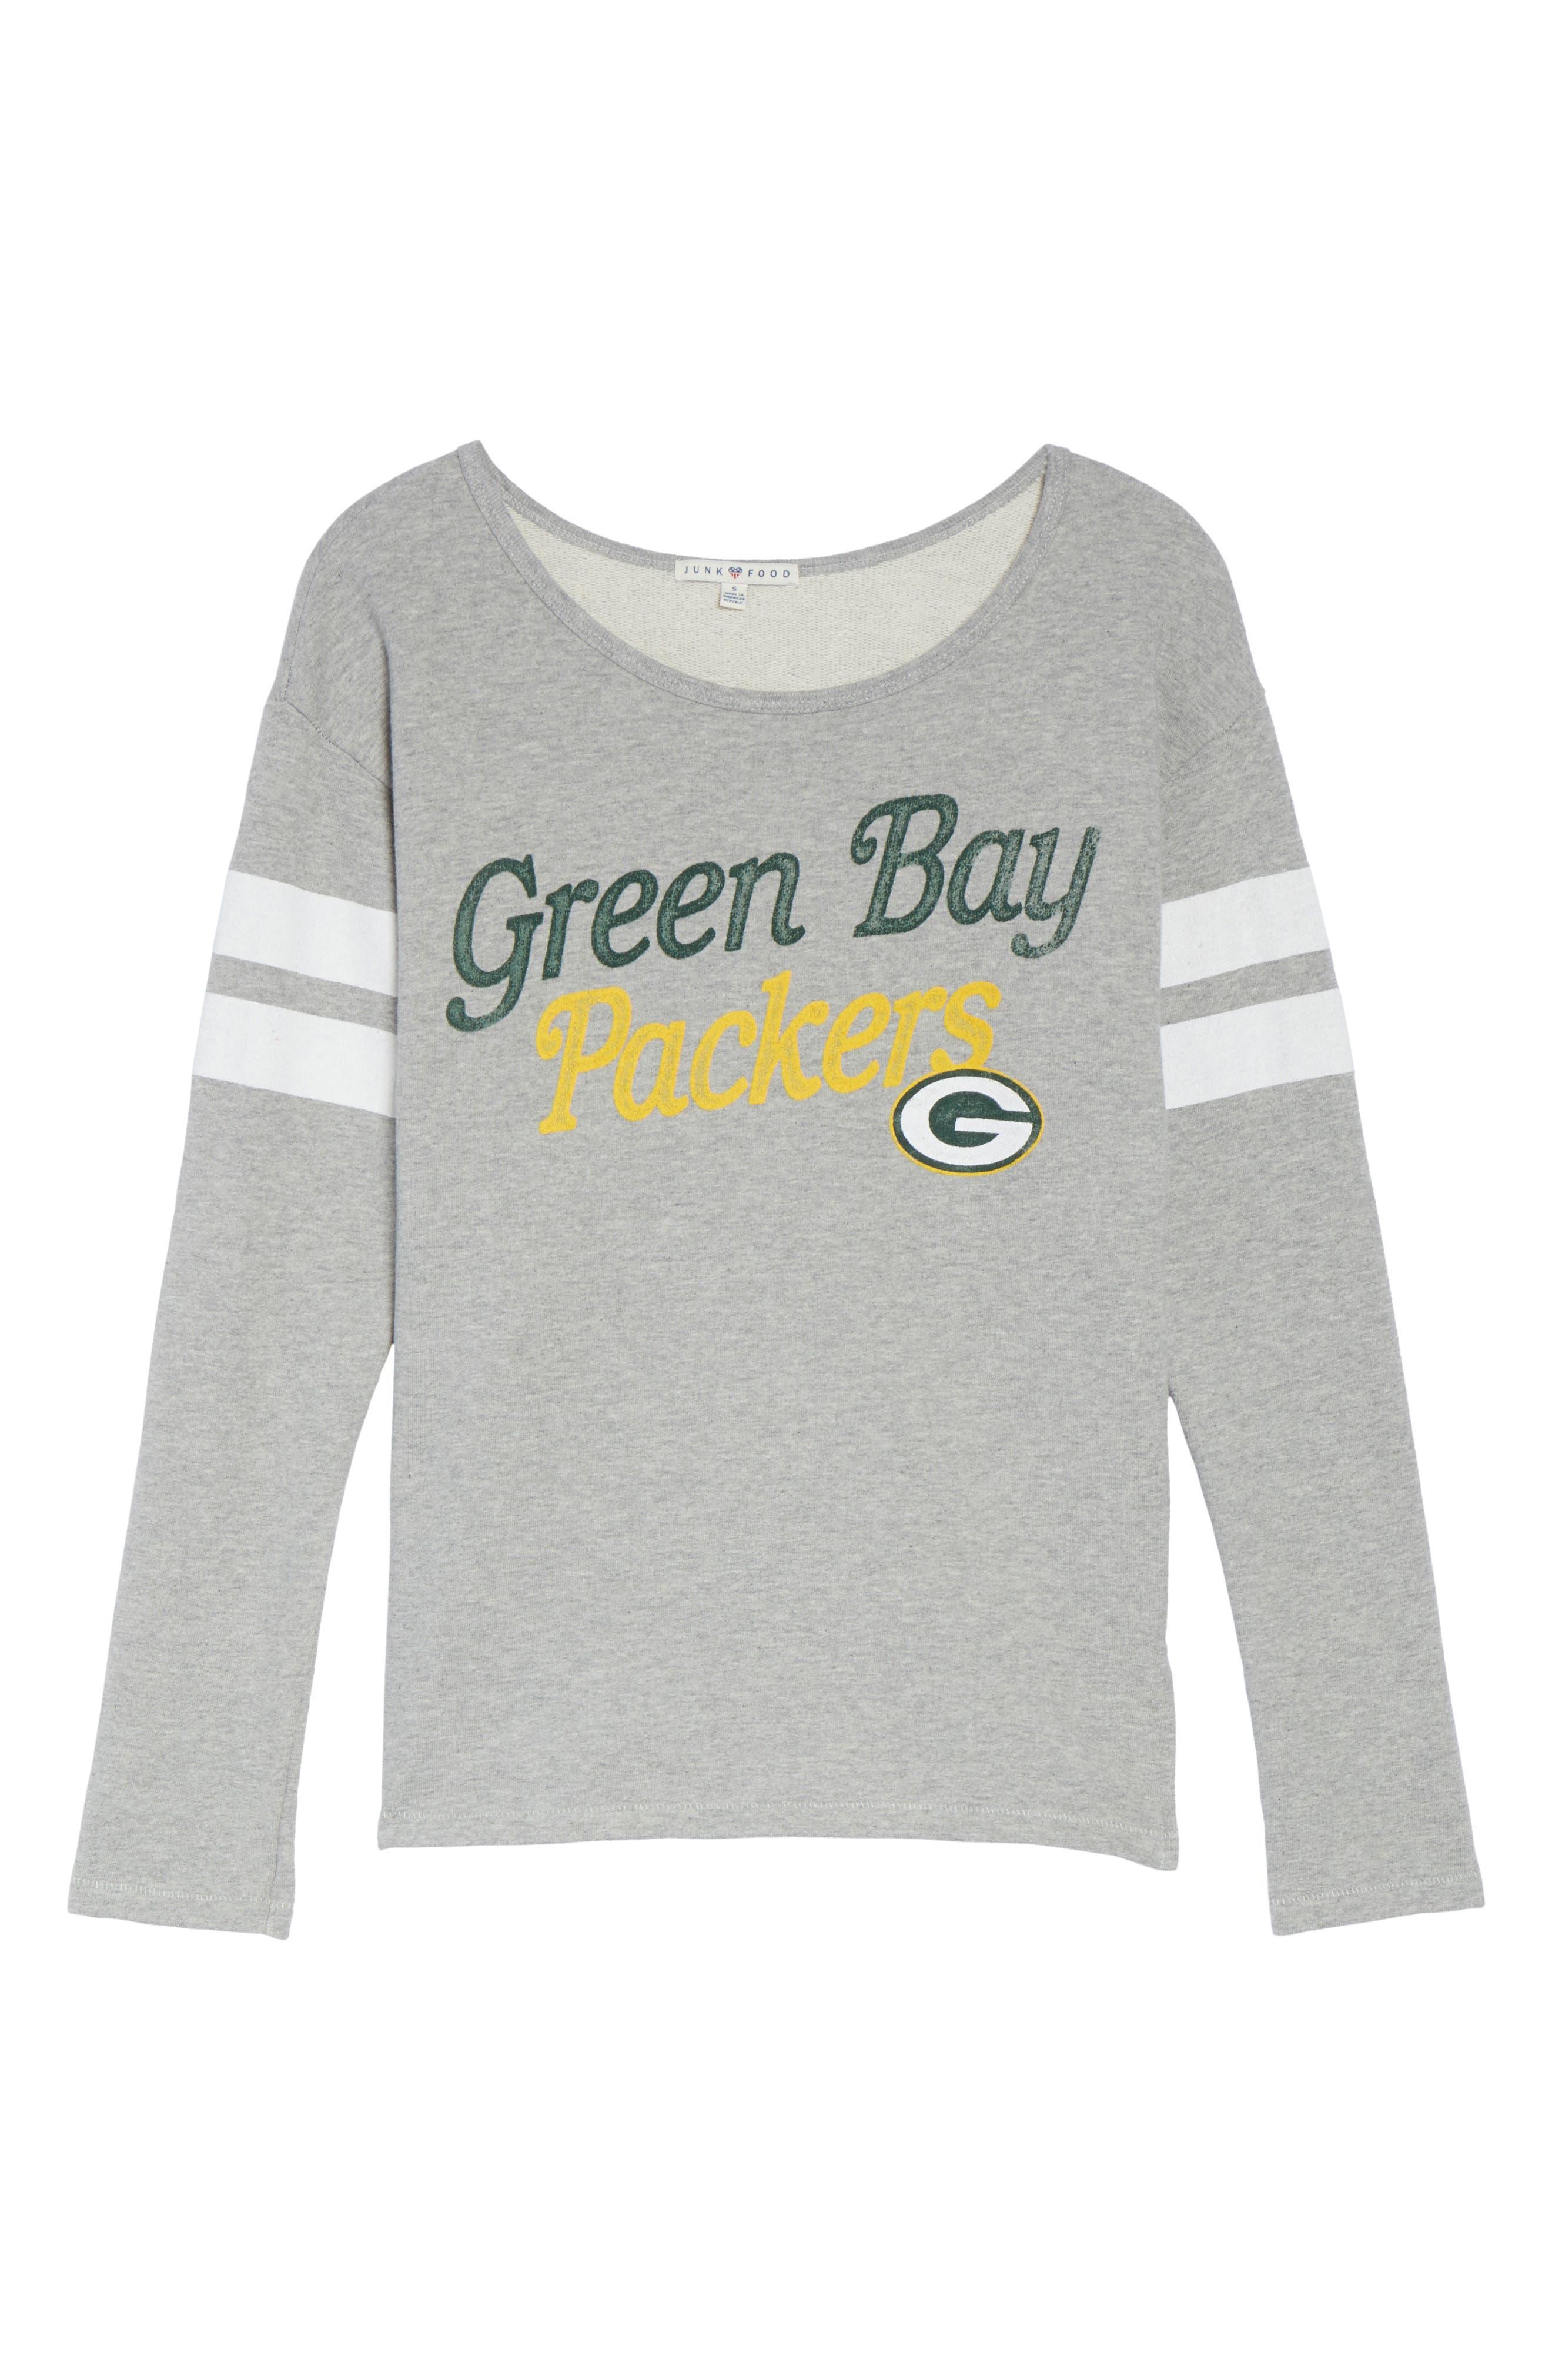 NFL Green Bay Packers Champion Sweatshirt,                             Alternate thumbnail 6, color,                             028